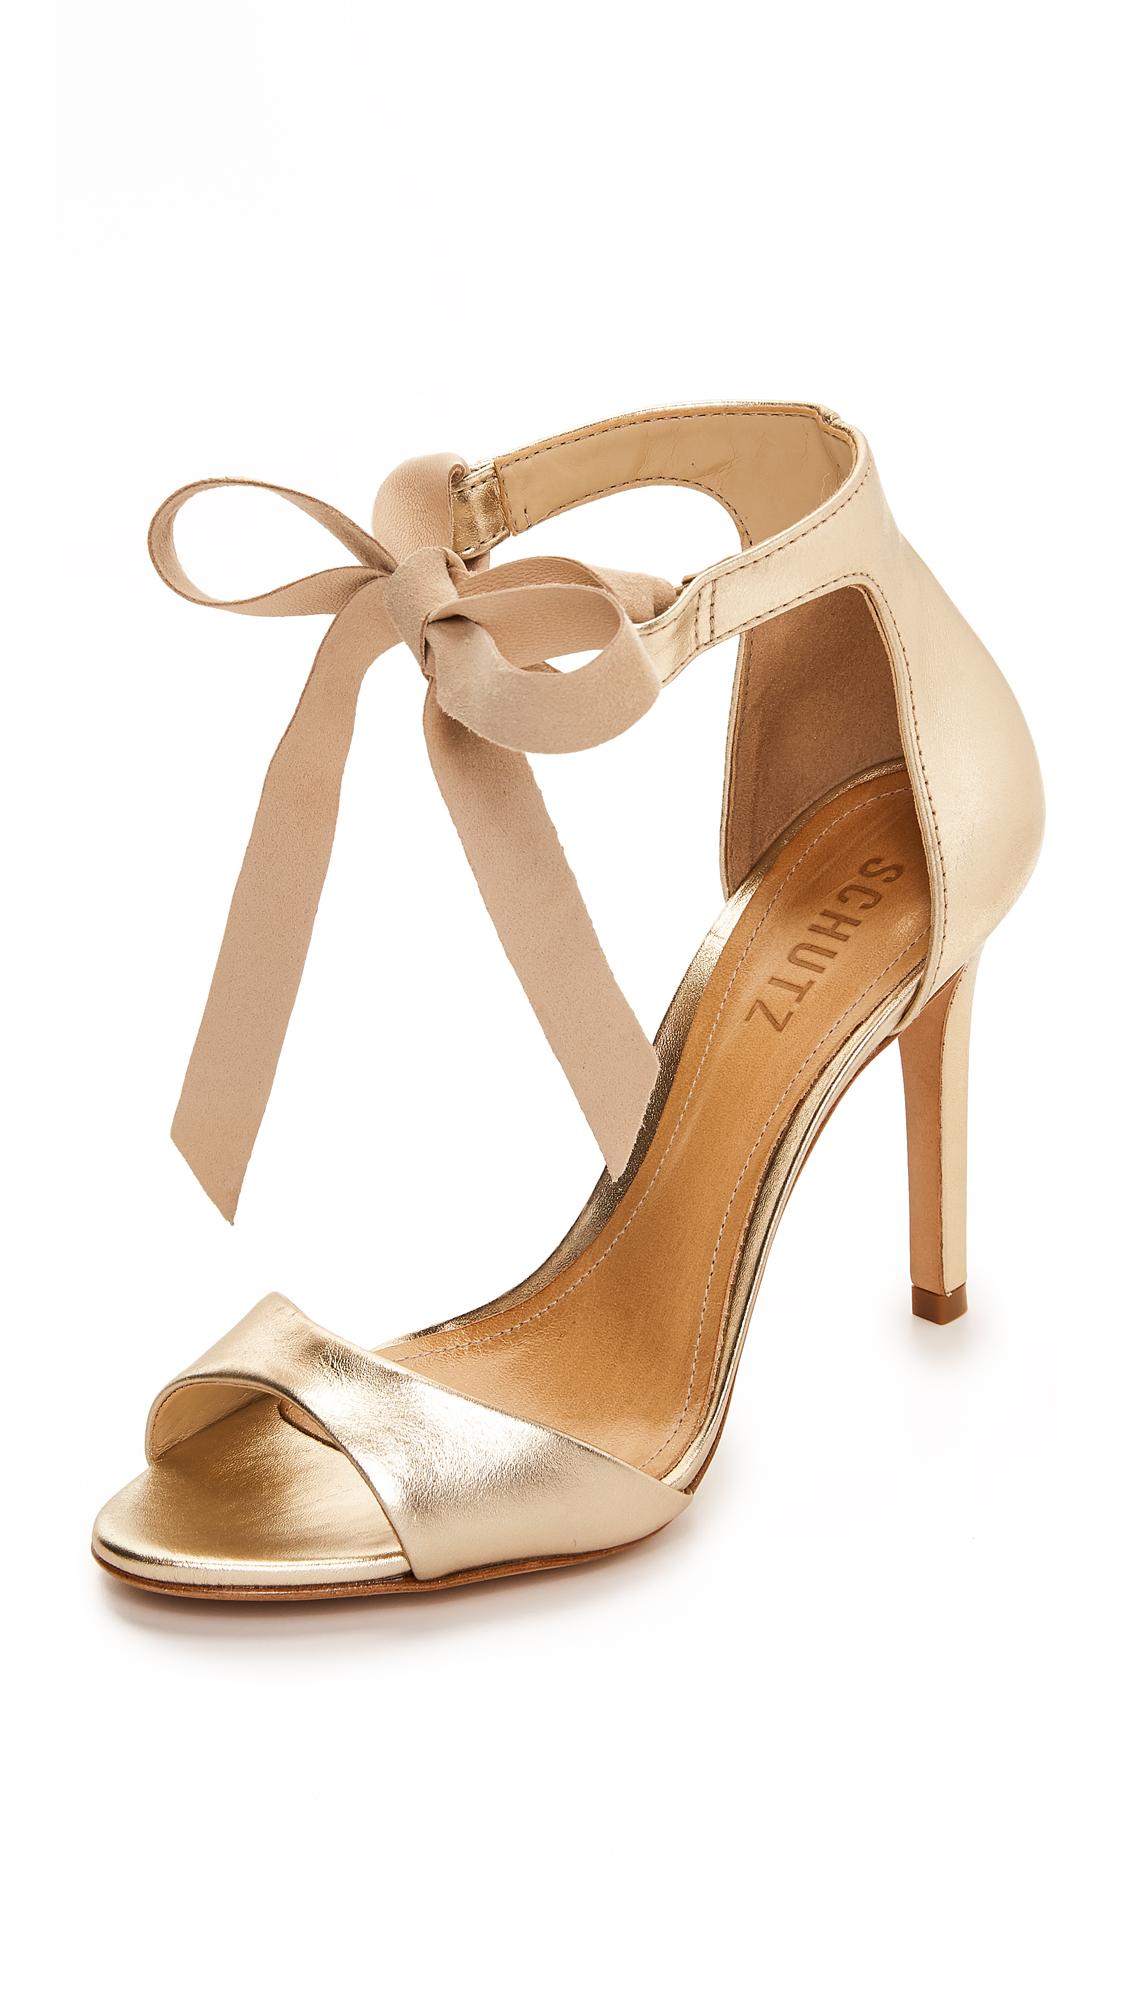 Schutz Rene Tie Sandals - Platina